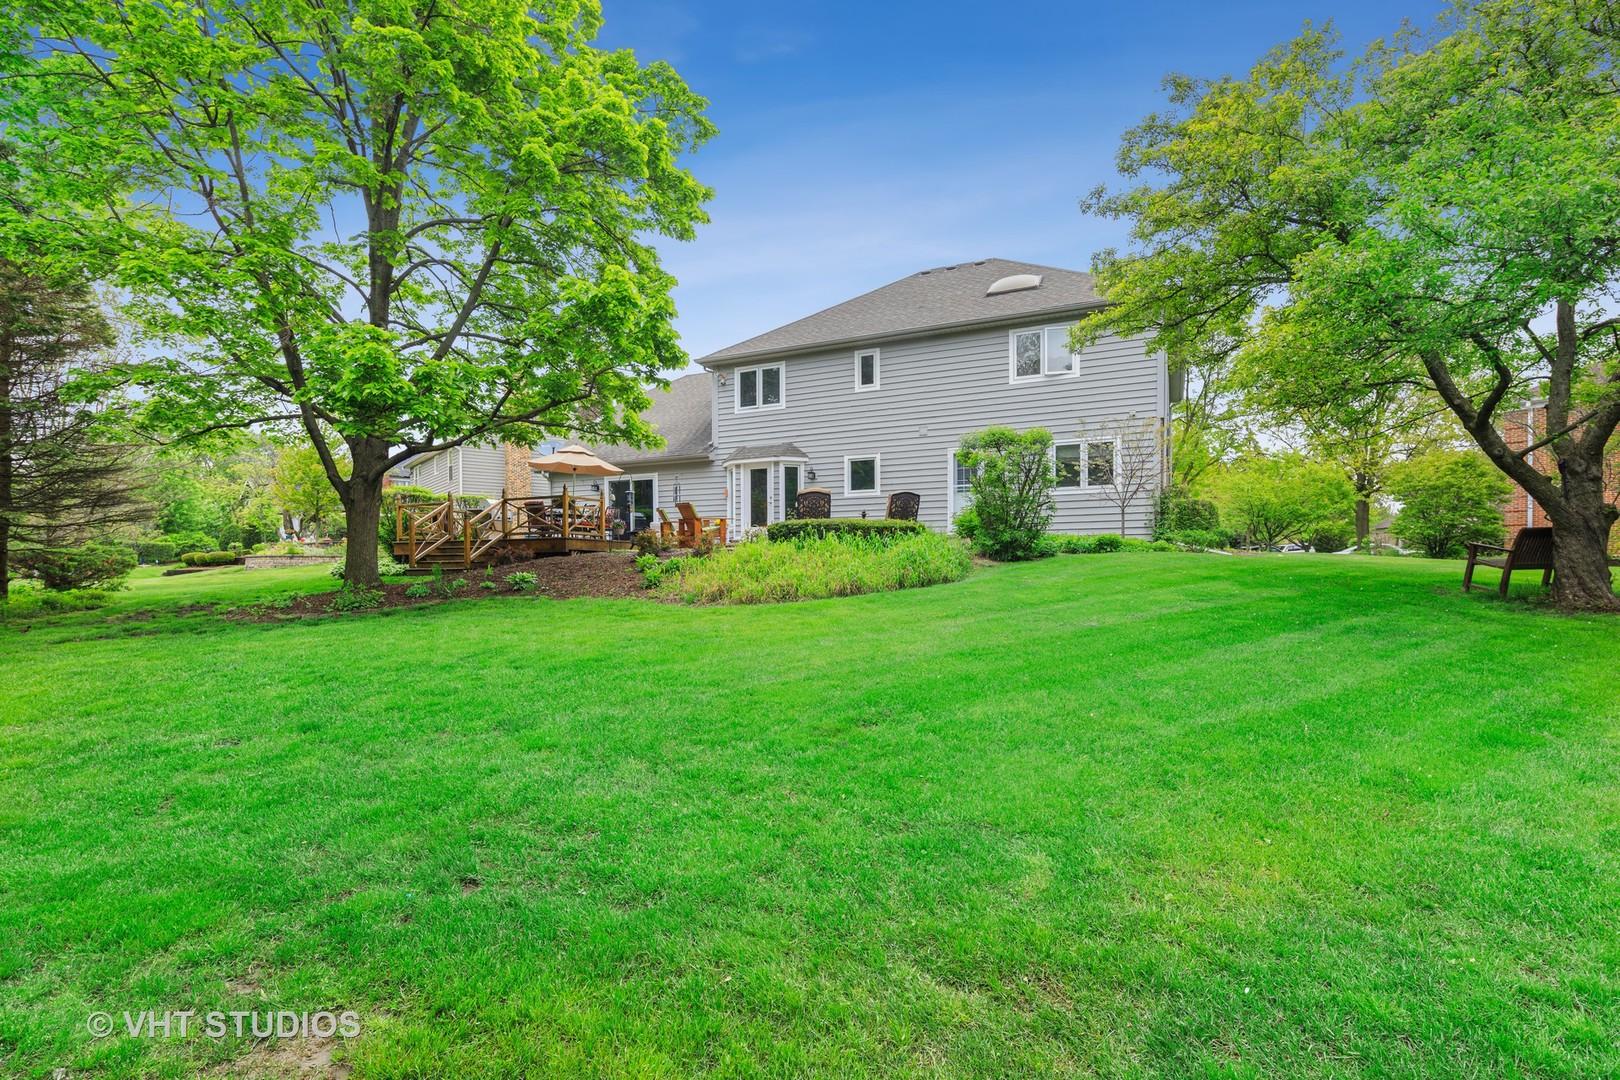 213 Meadowbrook, Hinsdale, Illinois, 60521